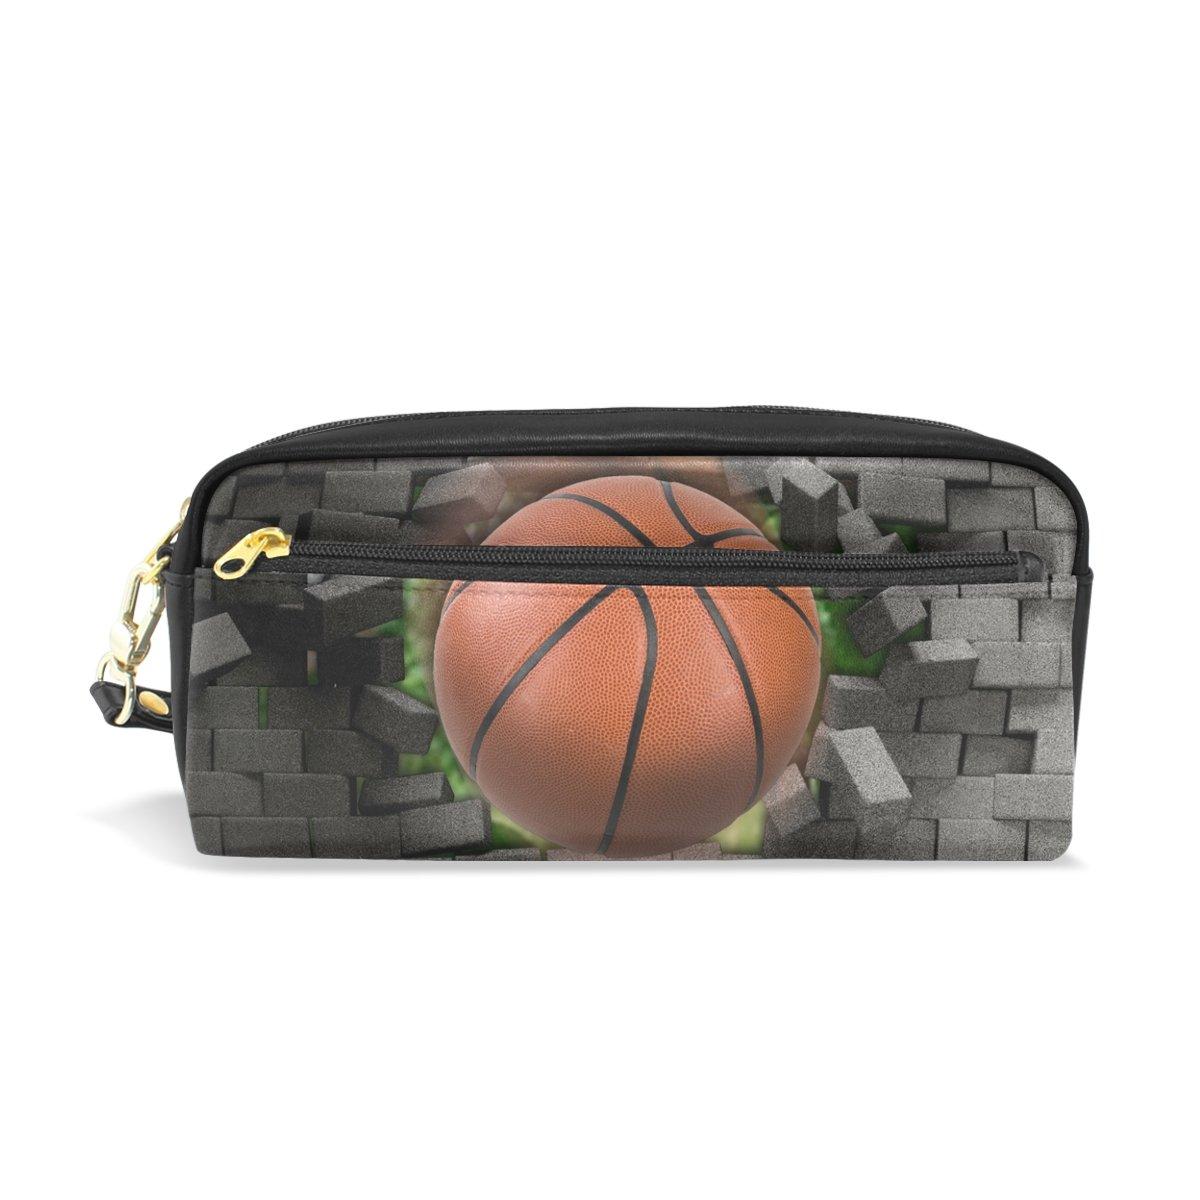 zzkko deporte baloncesto funda de piel cremallera lápiz pluma ...